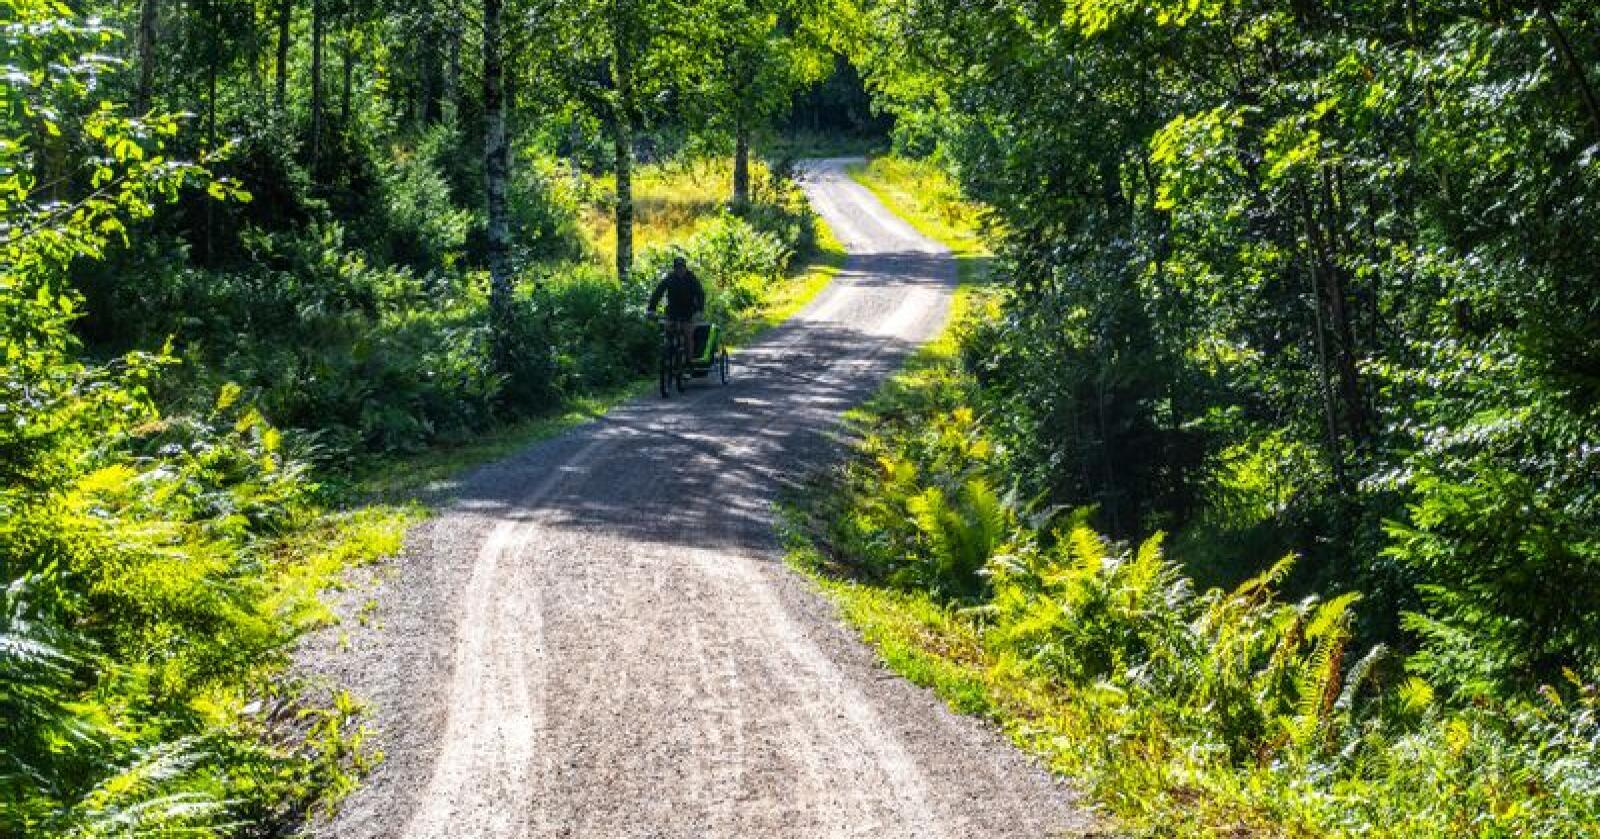 Skogsbilvei i Østmarka i Oslo. Foto: Halvard Alvik / NTB scanpix